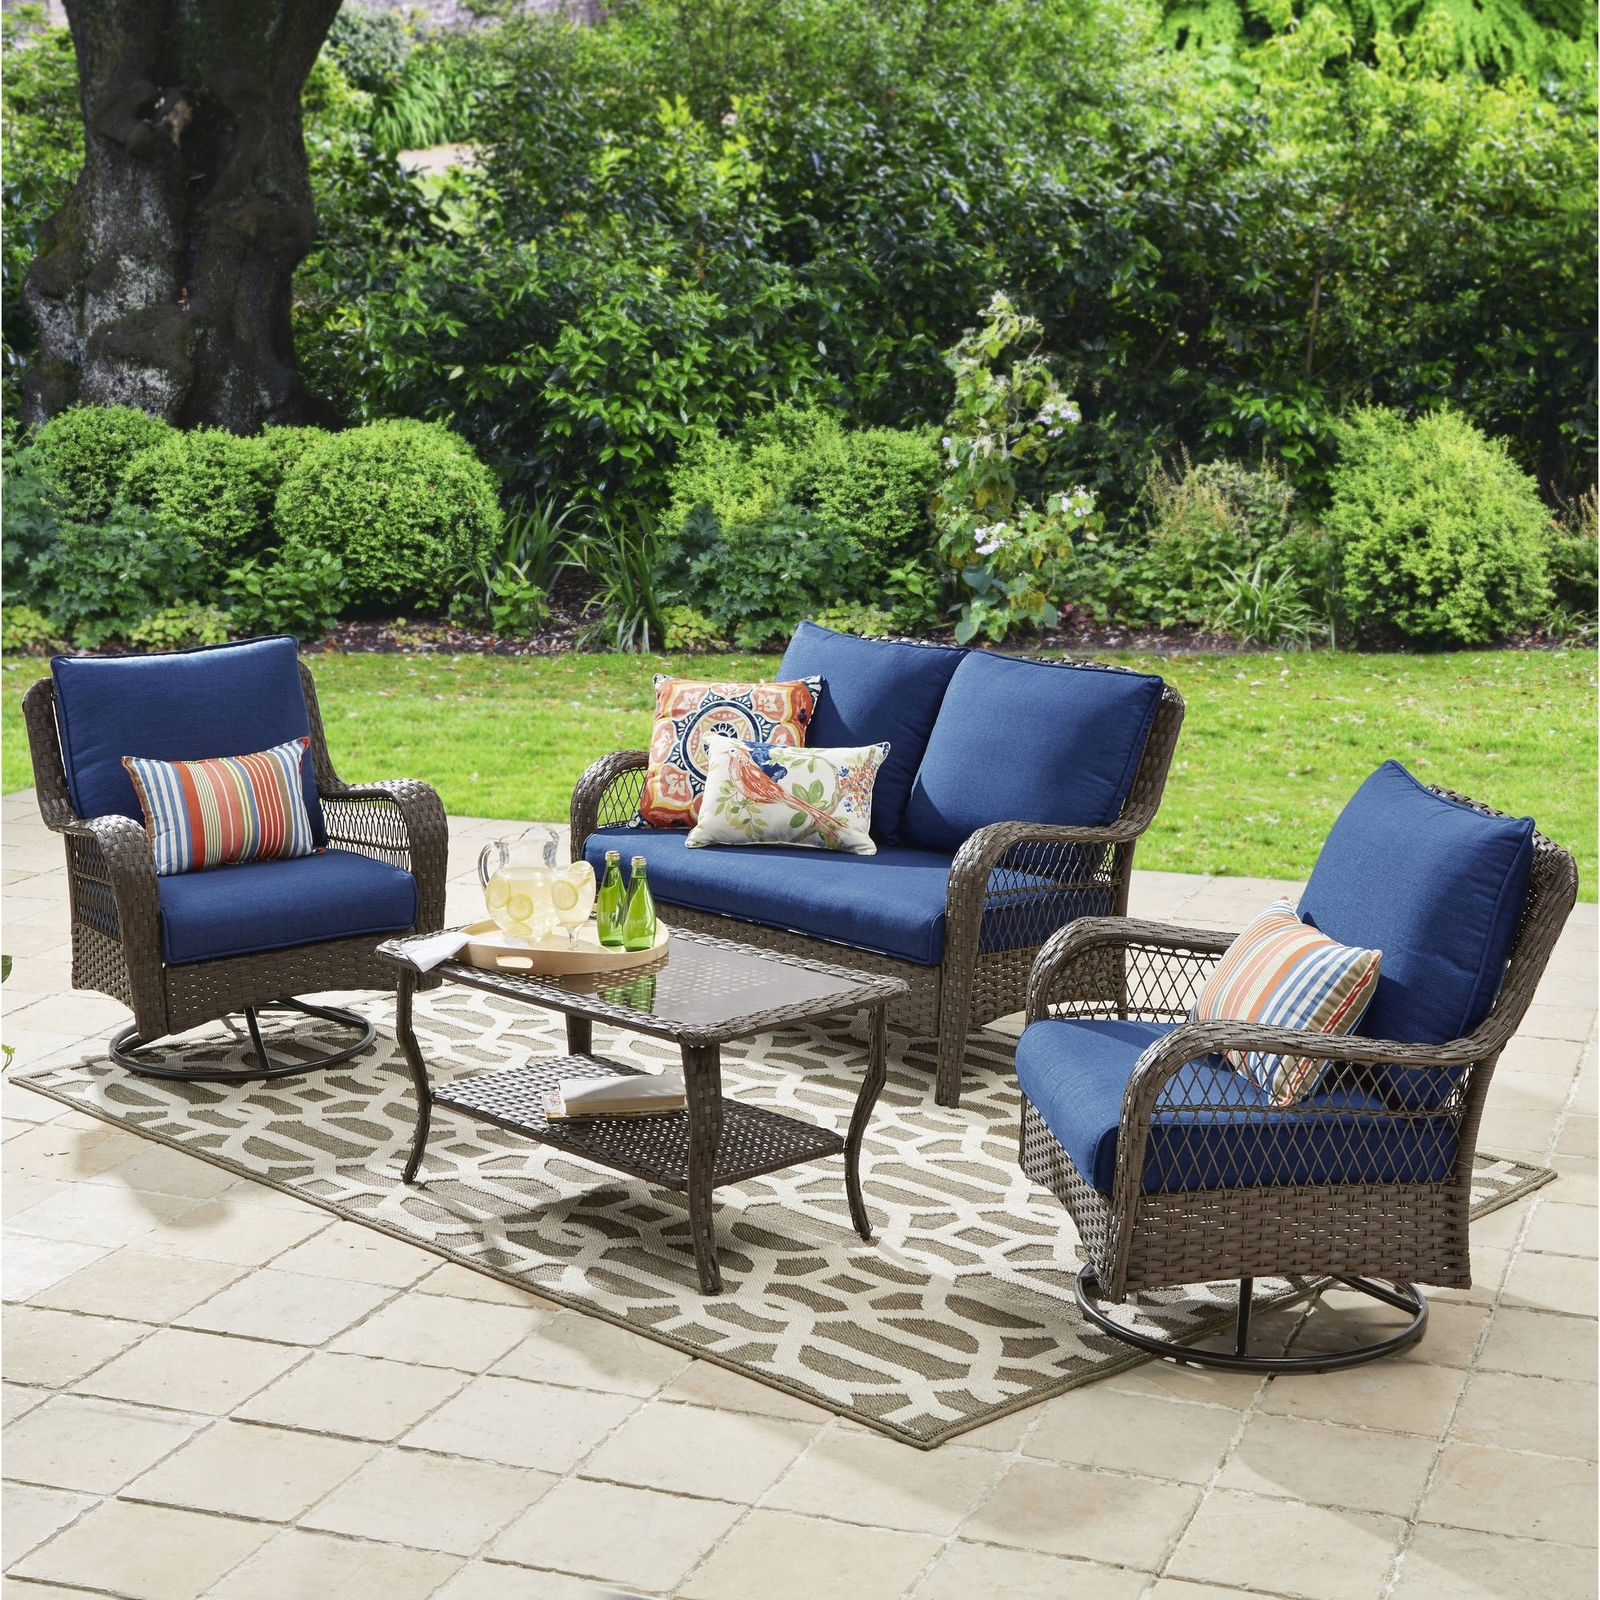 Popular Ebay Patio Conversation Sets In Colebrook 4 Piece Outdoor Patio Conversation Set Seats 4 Deck (View 3 of 15)